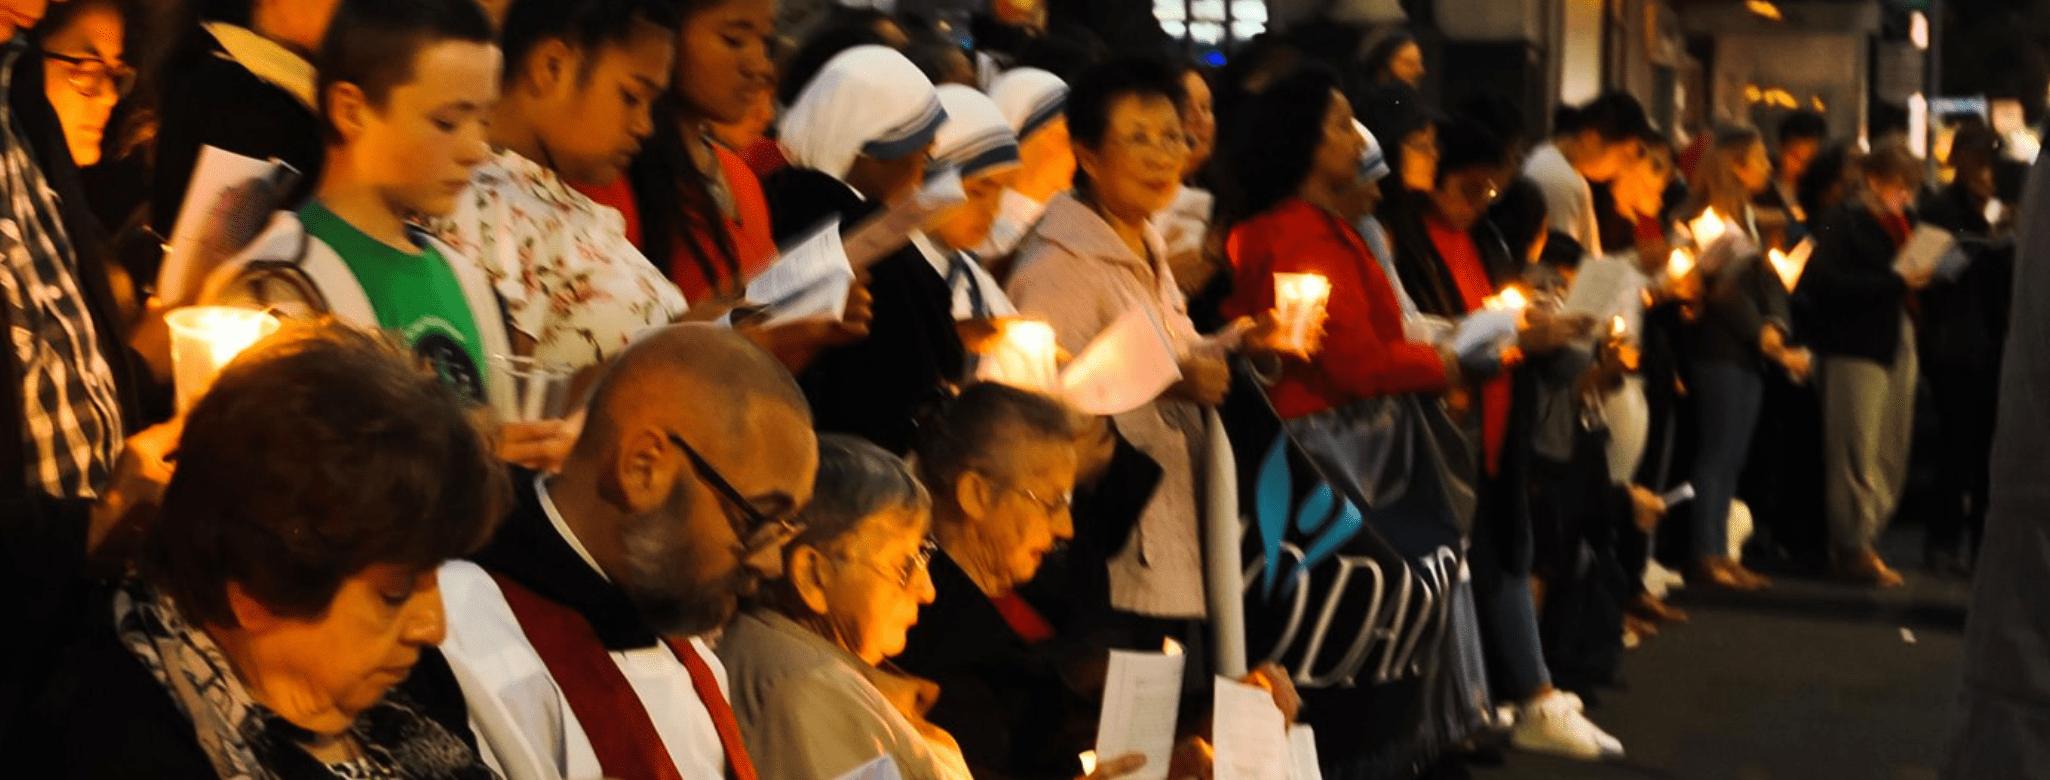 Candlelight vigil 2021